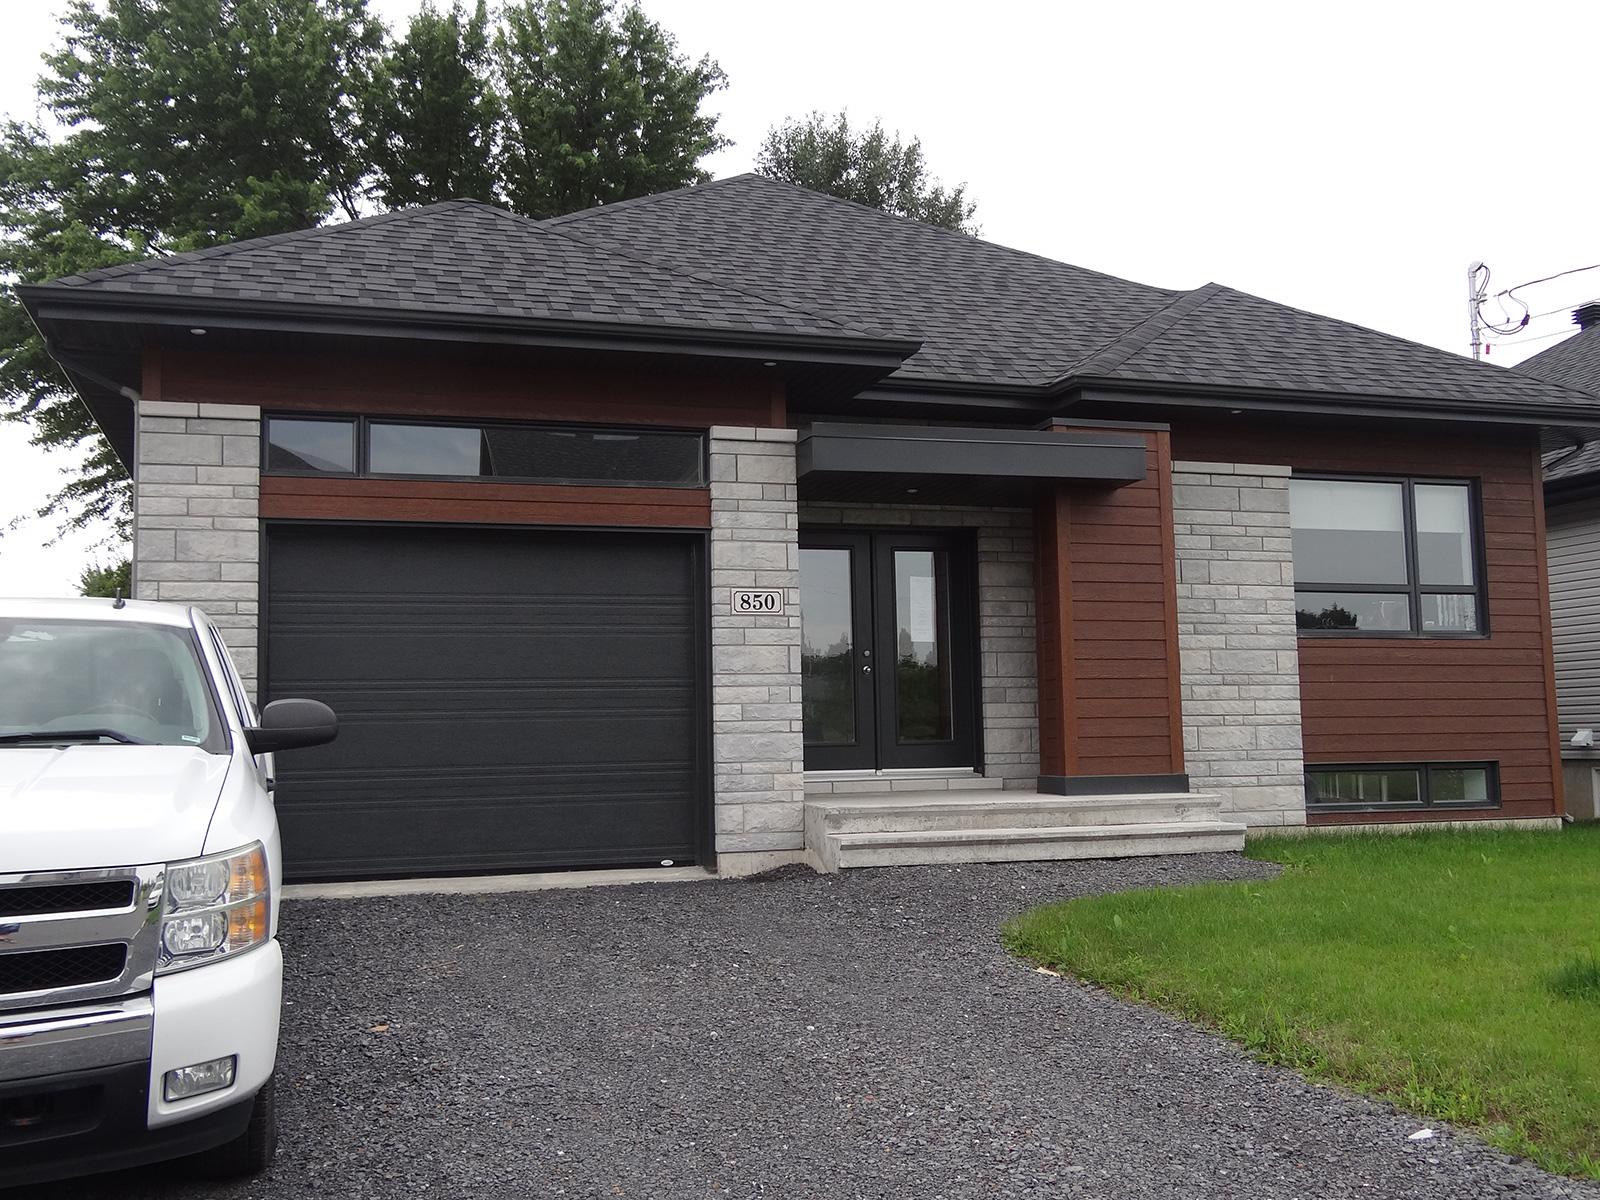 Le 850 habitations nergik for Bungalow garage